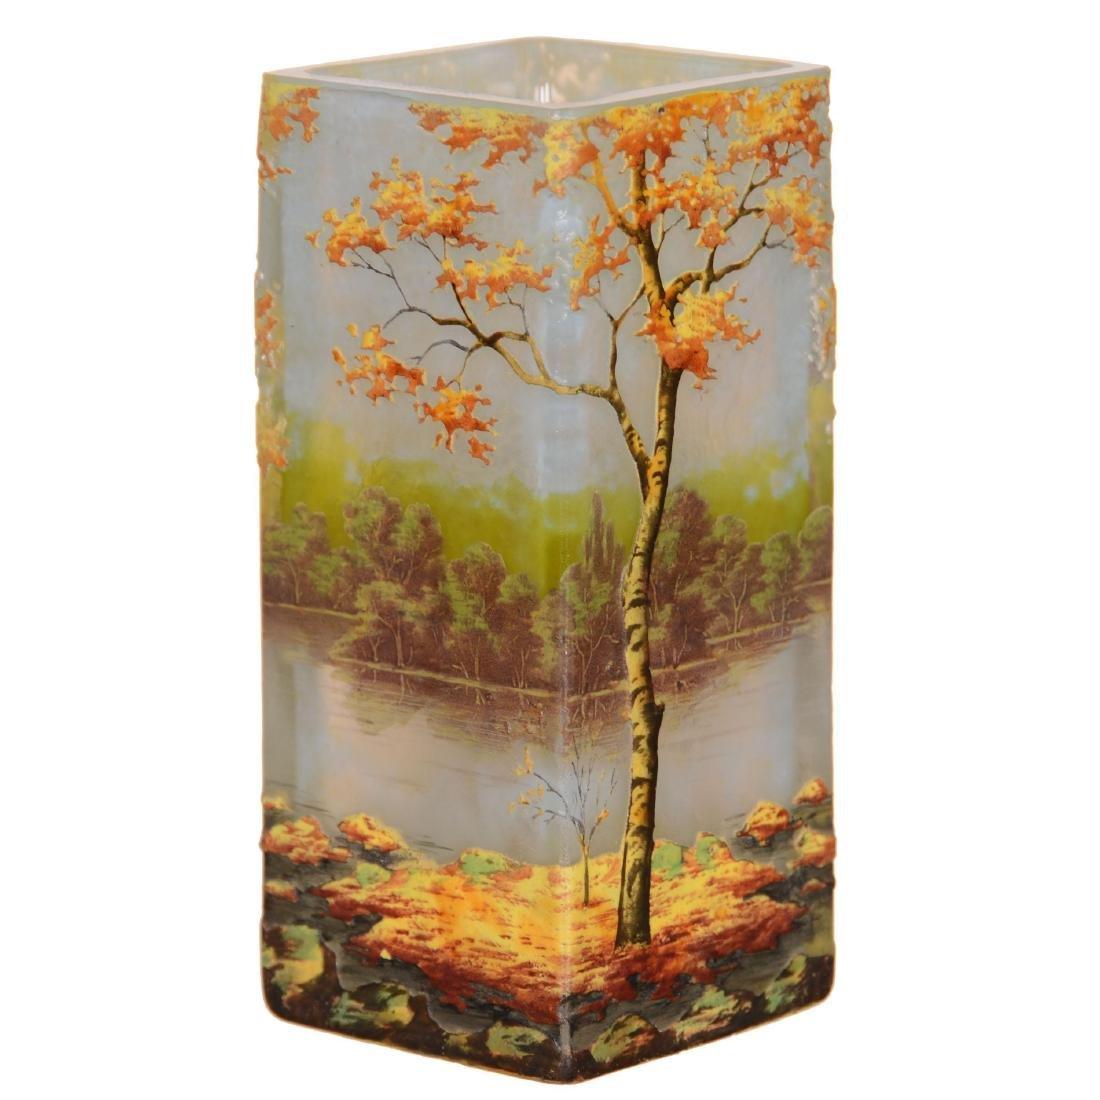 Daum Nancy French Cameo Art Glass Vase - 2